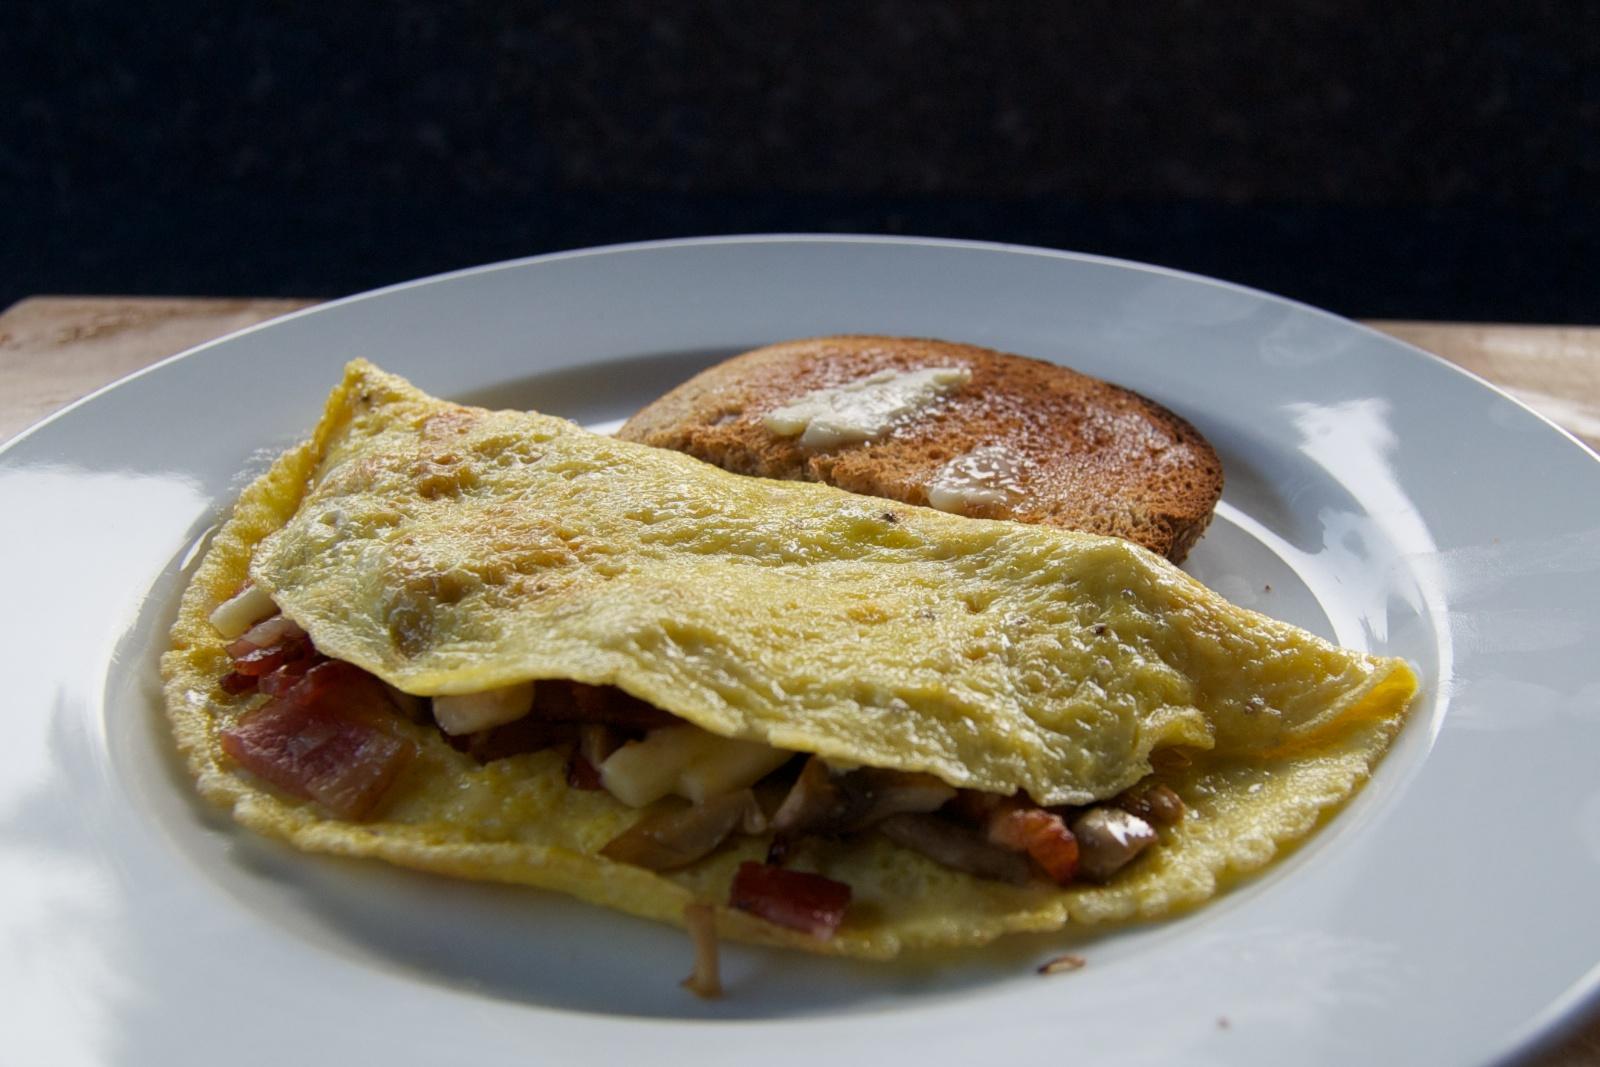 http://blog.rickk.com/food/2012/08/24/ate.2012.08.24.b.jpg